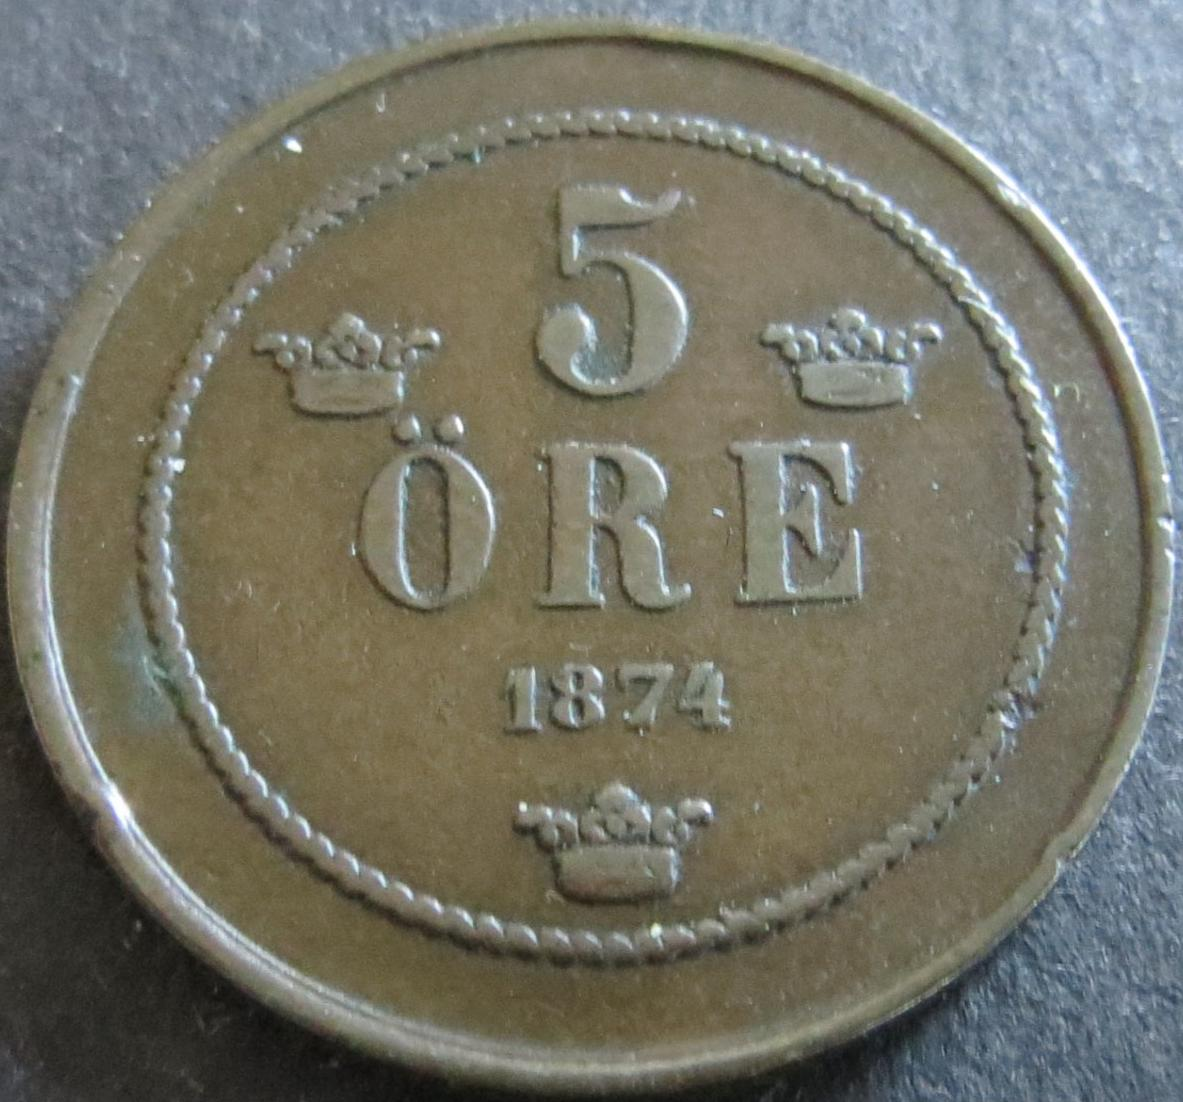 Münze Schweden 1874 - 5 Öre Oskar II. Bekröntes Monogramm 27mm Kupfer vz